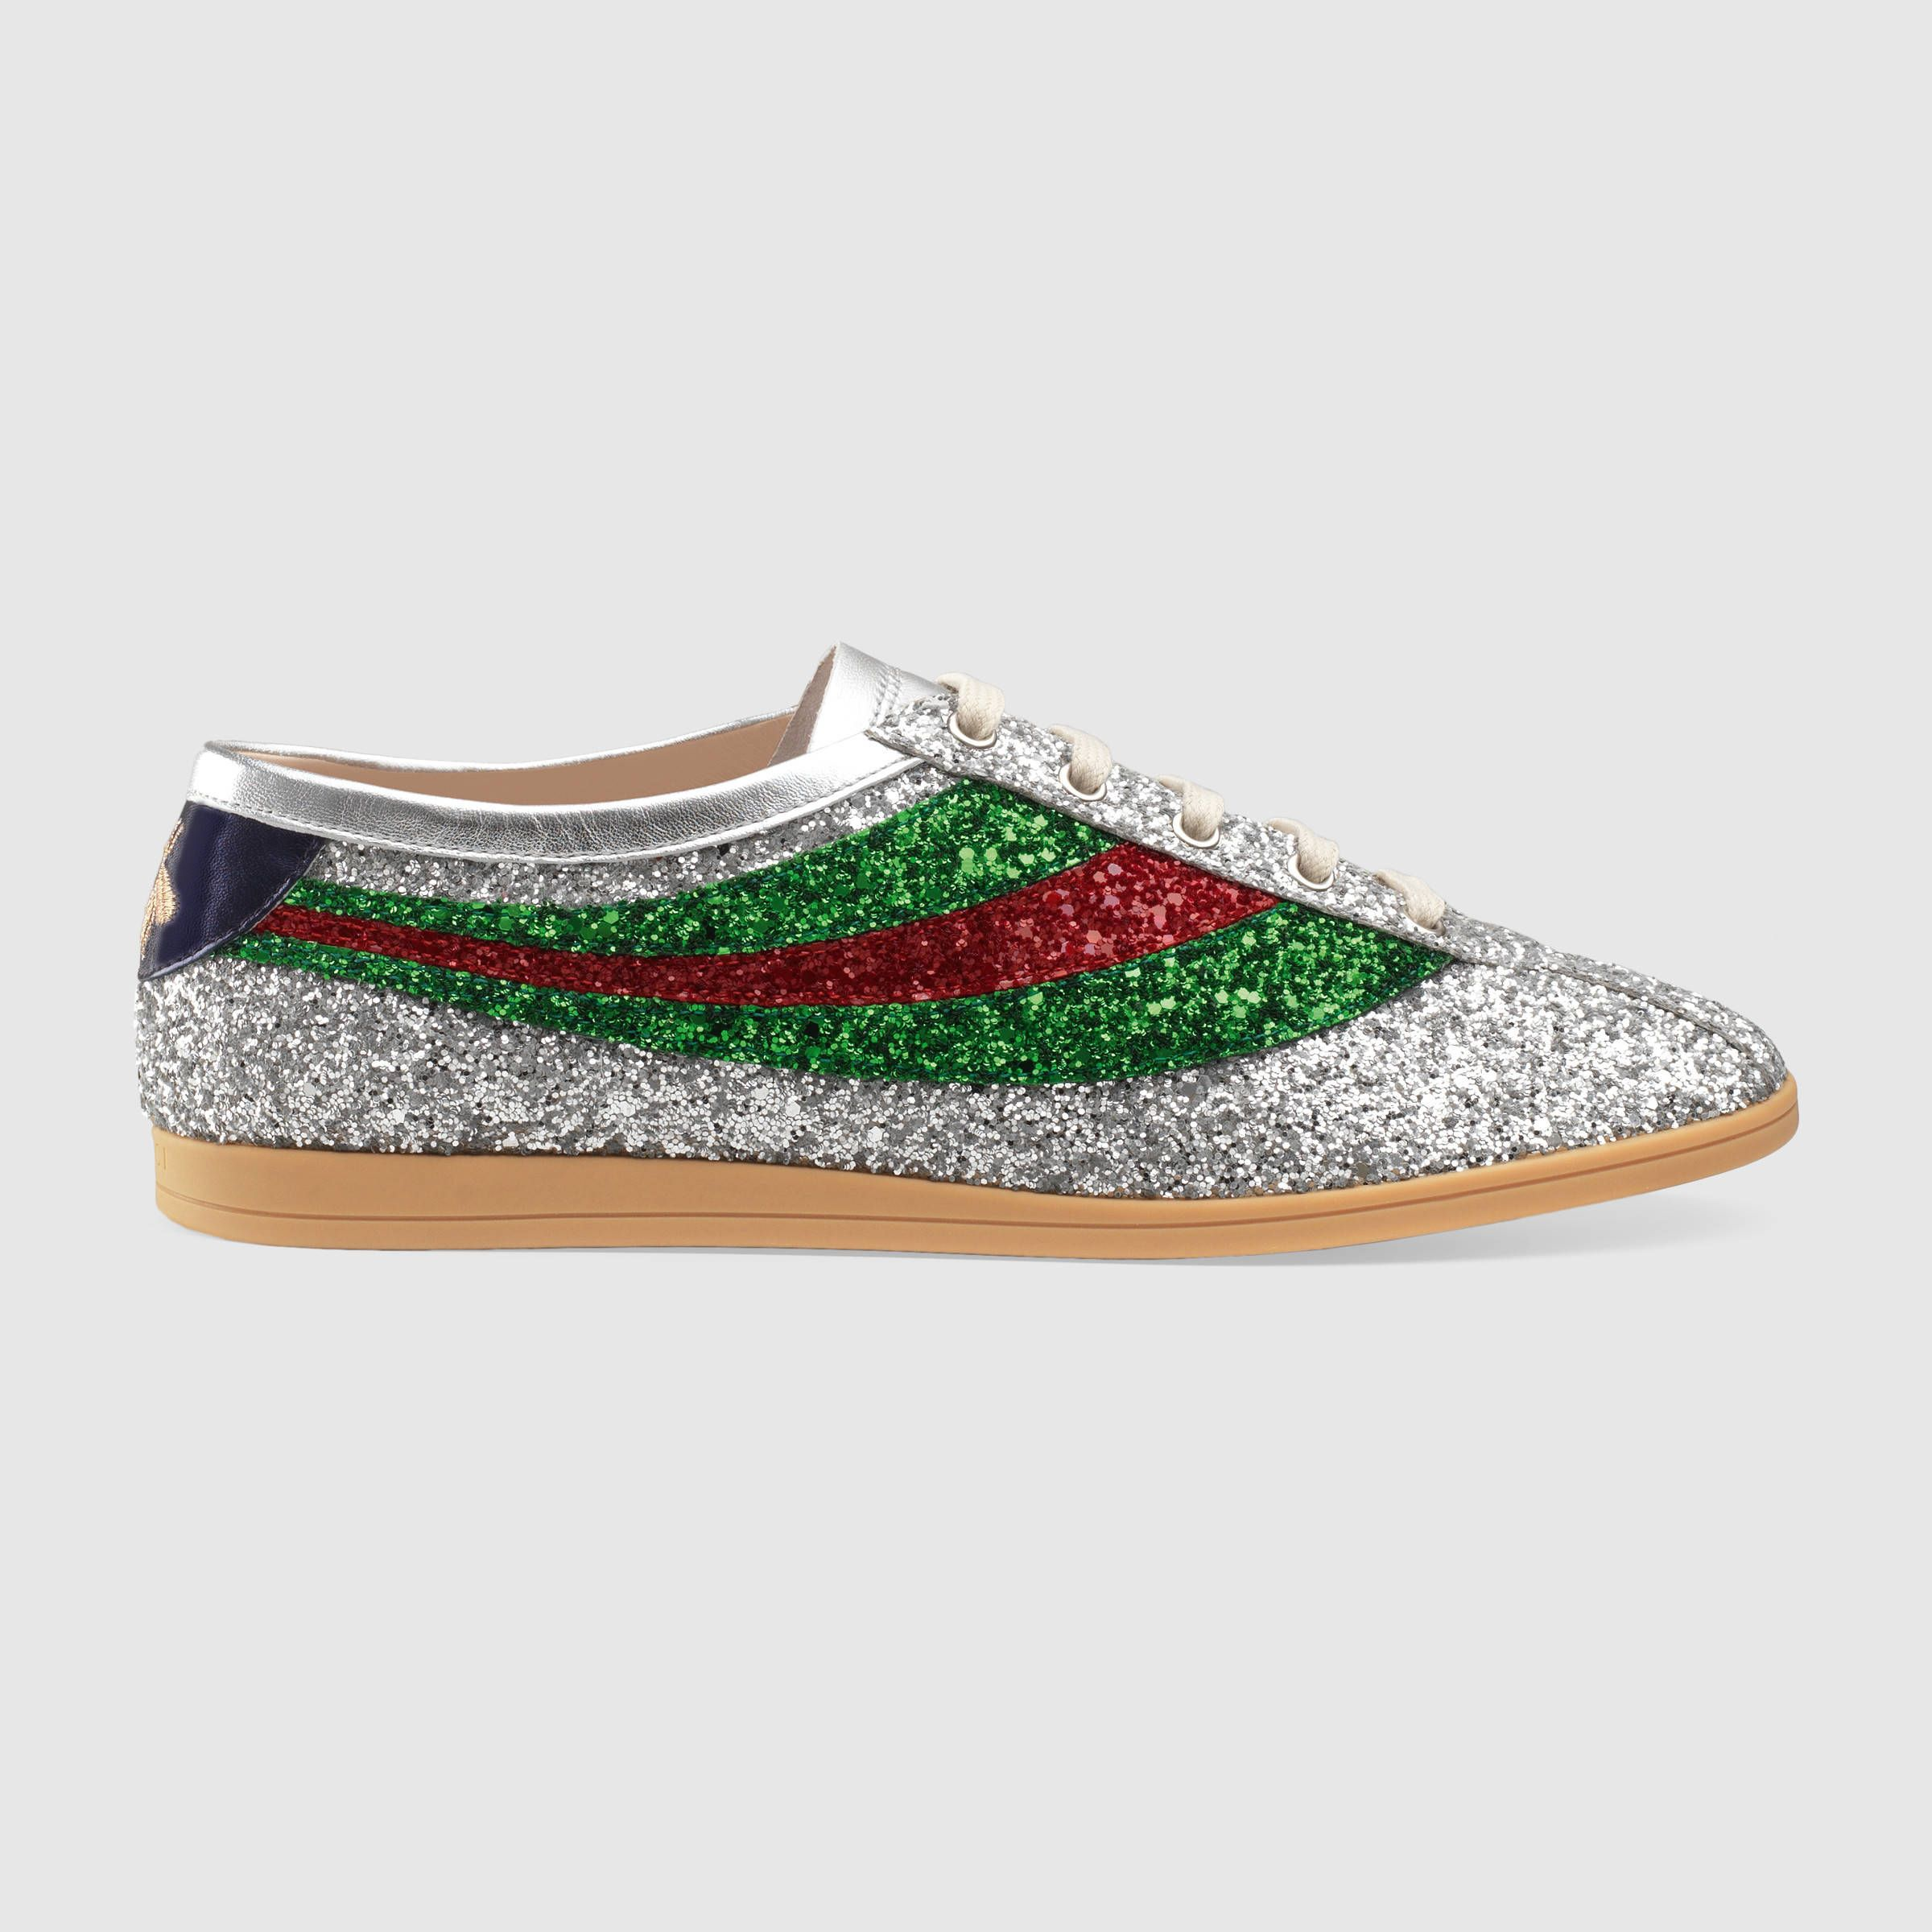 Gucci Bee Glitter Sneaker IvlTJSR7wM